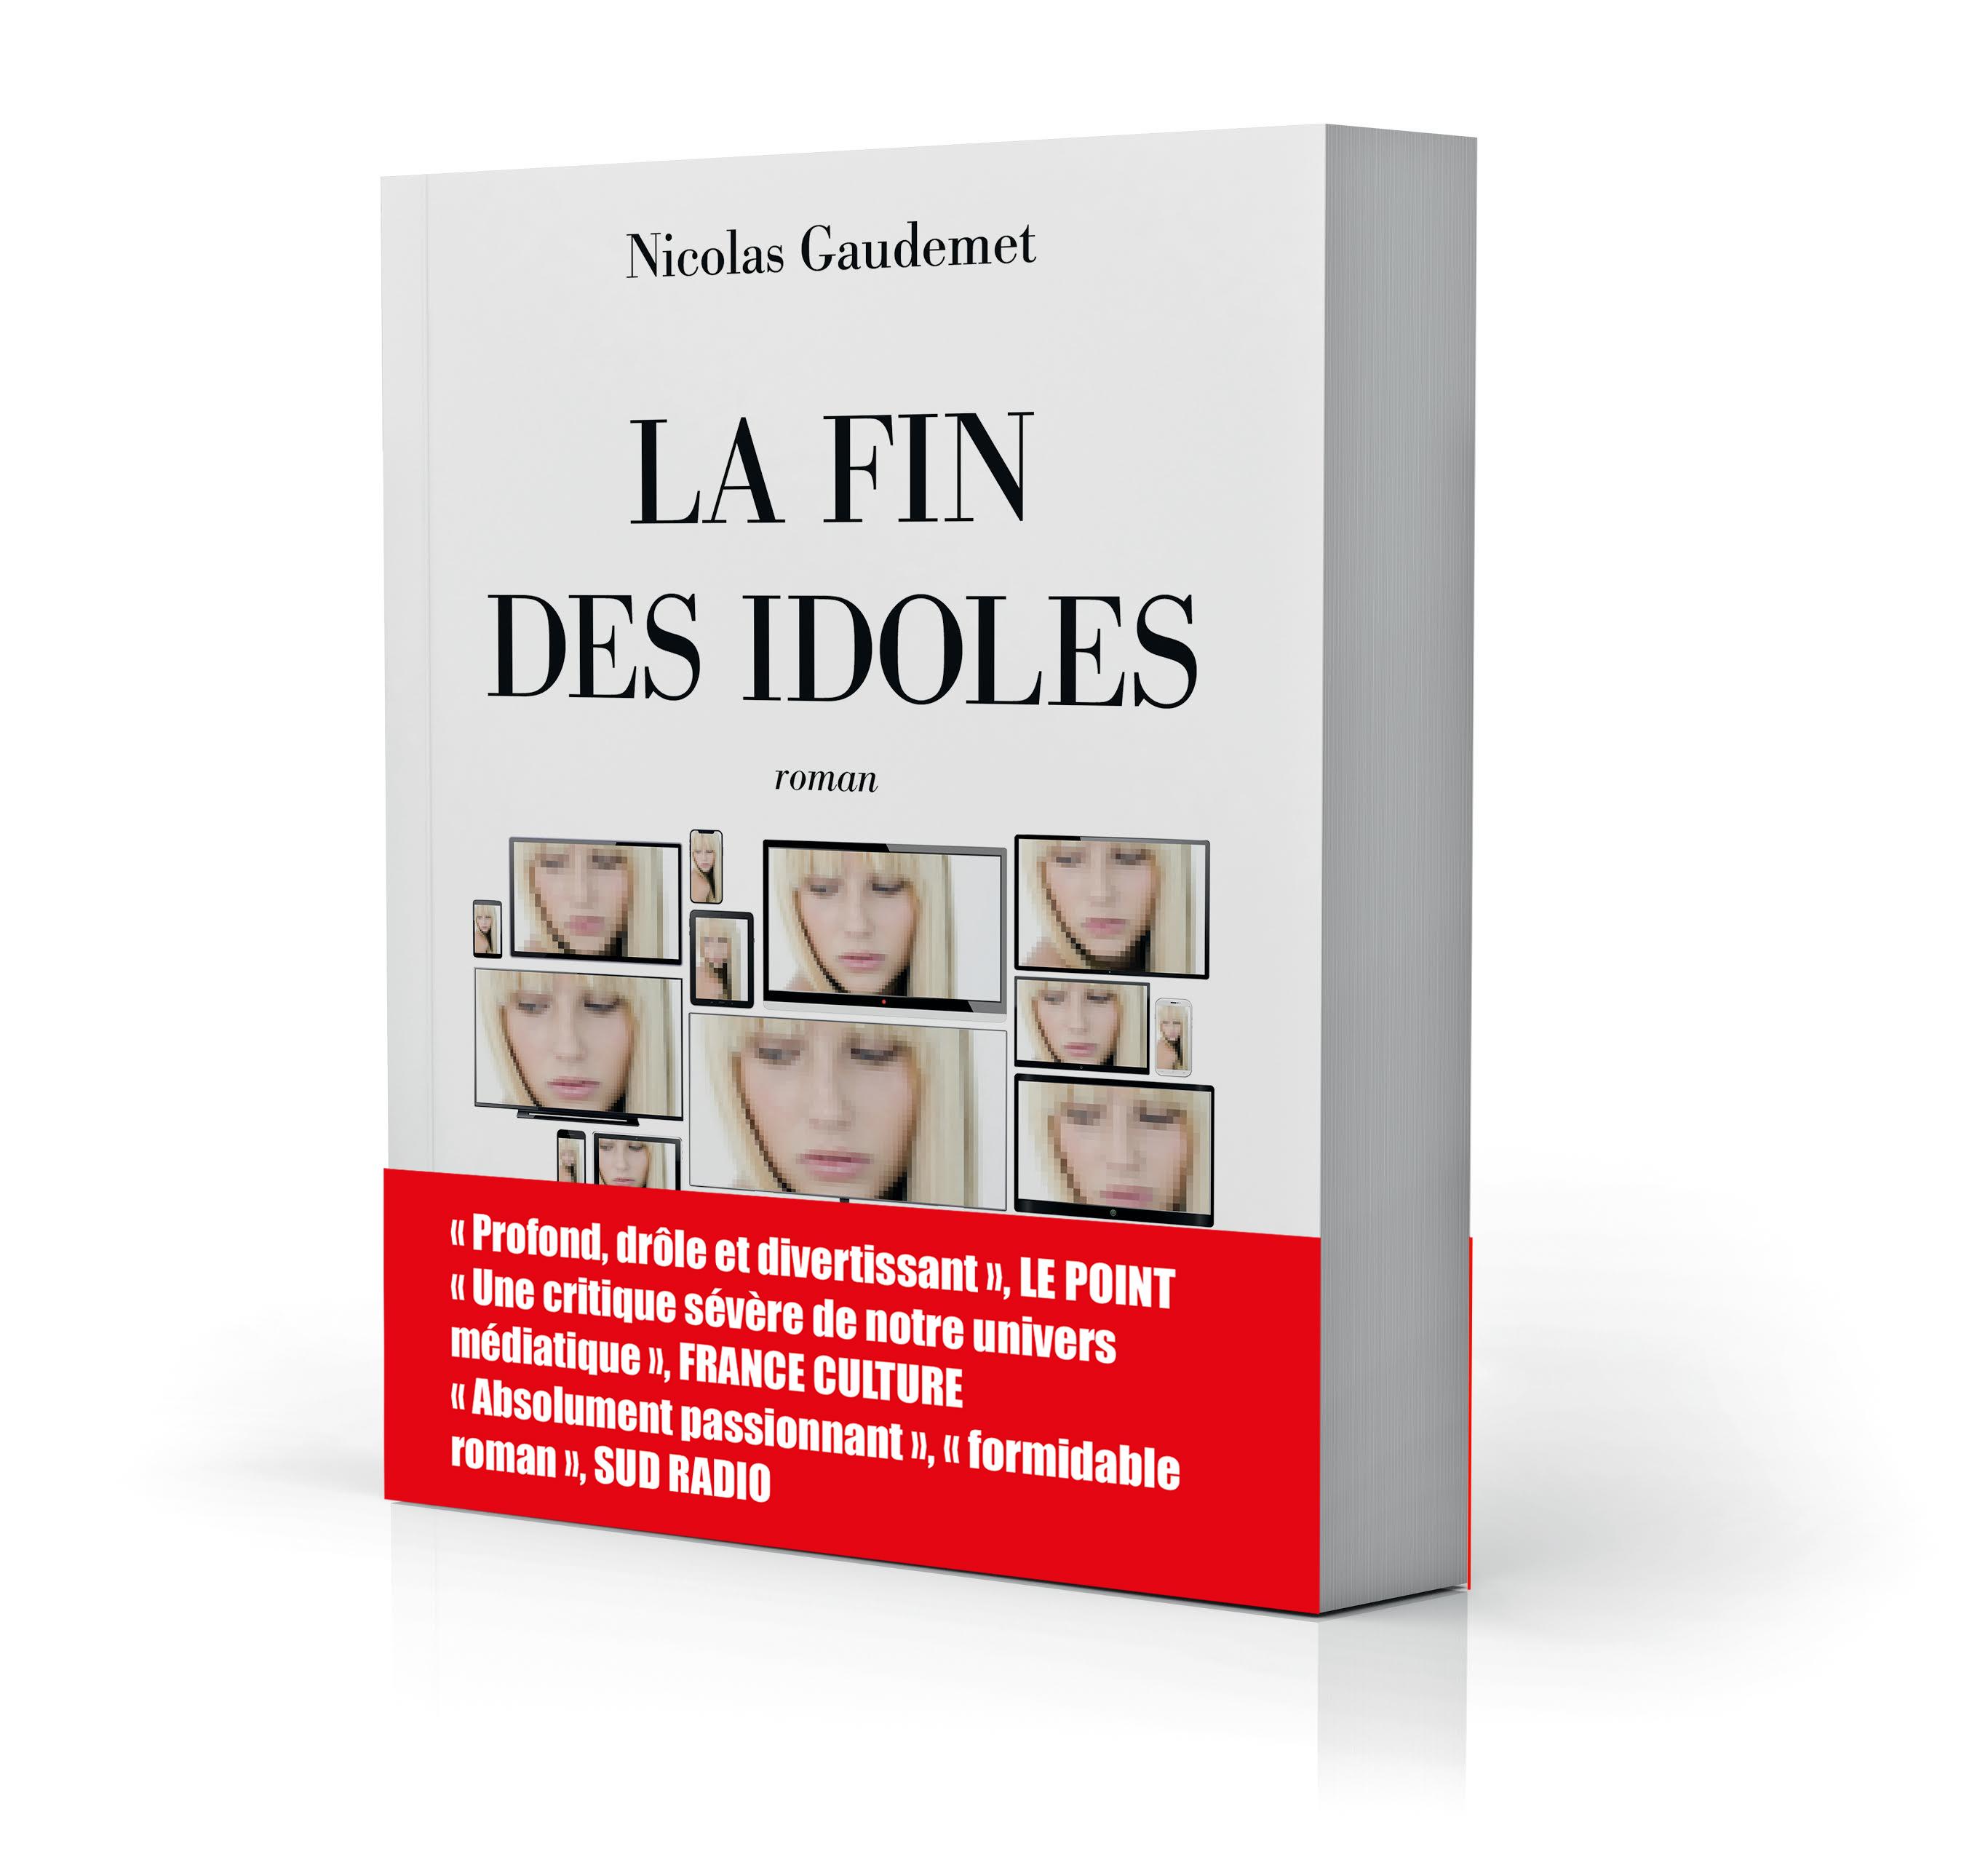 Jeremstar, Michel Onfray, Yann Barthès, Natacha Polony, Alain FInkielkraut dans La Fin des idoles